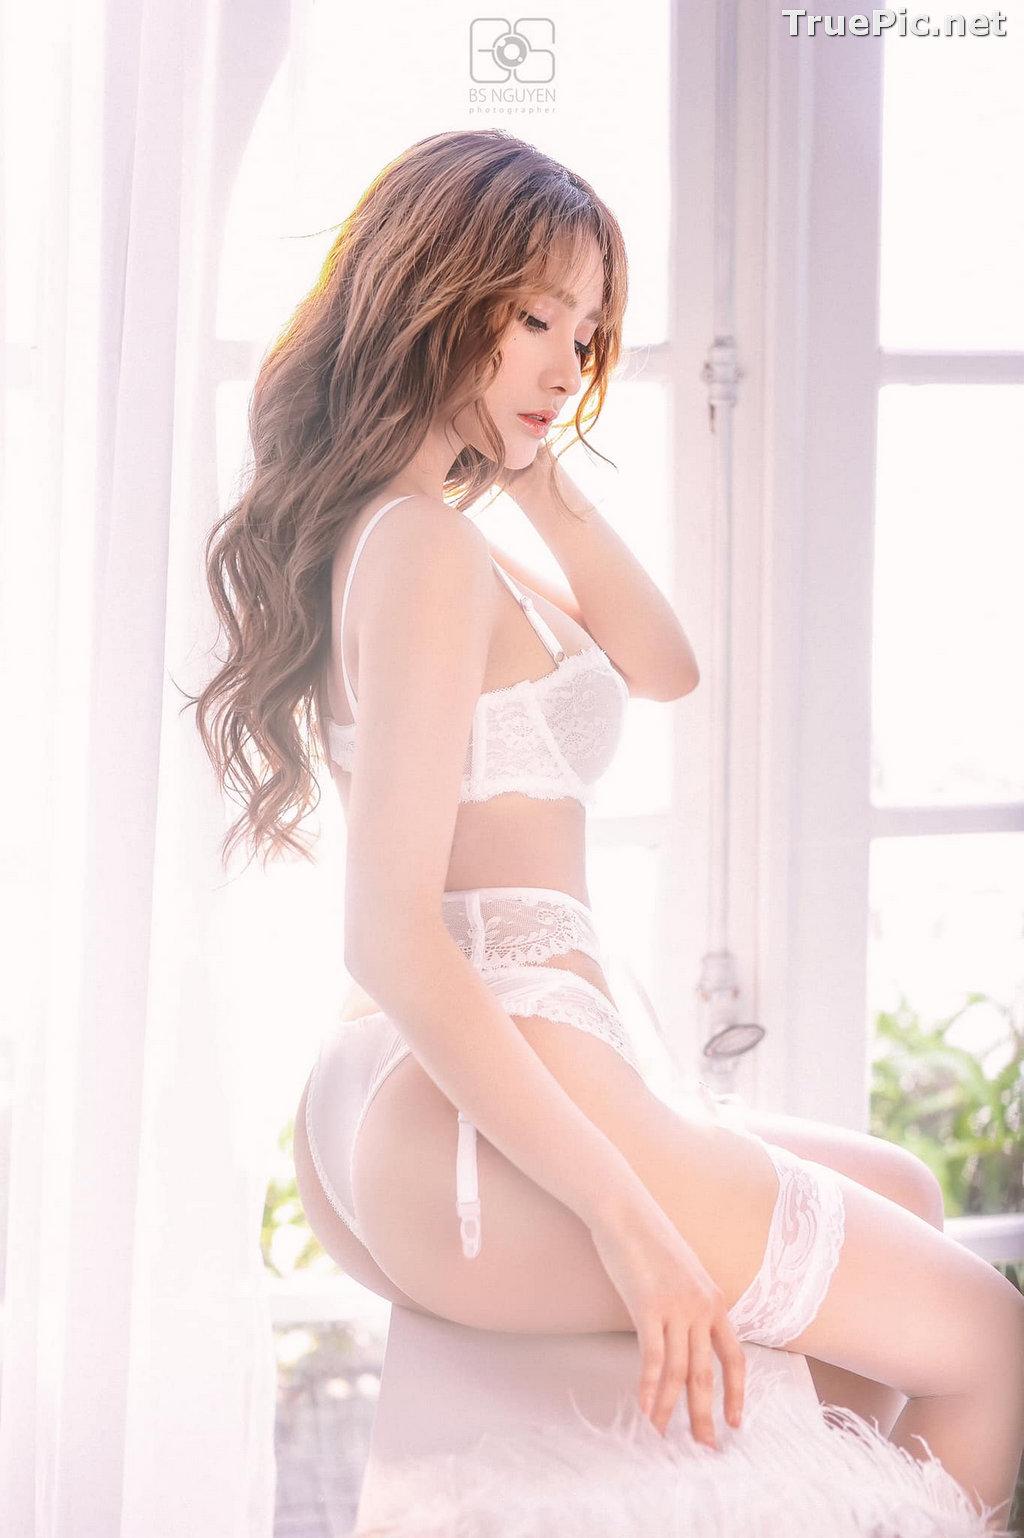 Image Vietnamese Model - Nguyen Thi Phi Yen - Beautiful Sexy White Lingerie - TruePic.net - Picture-15